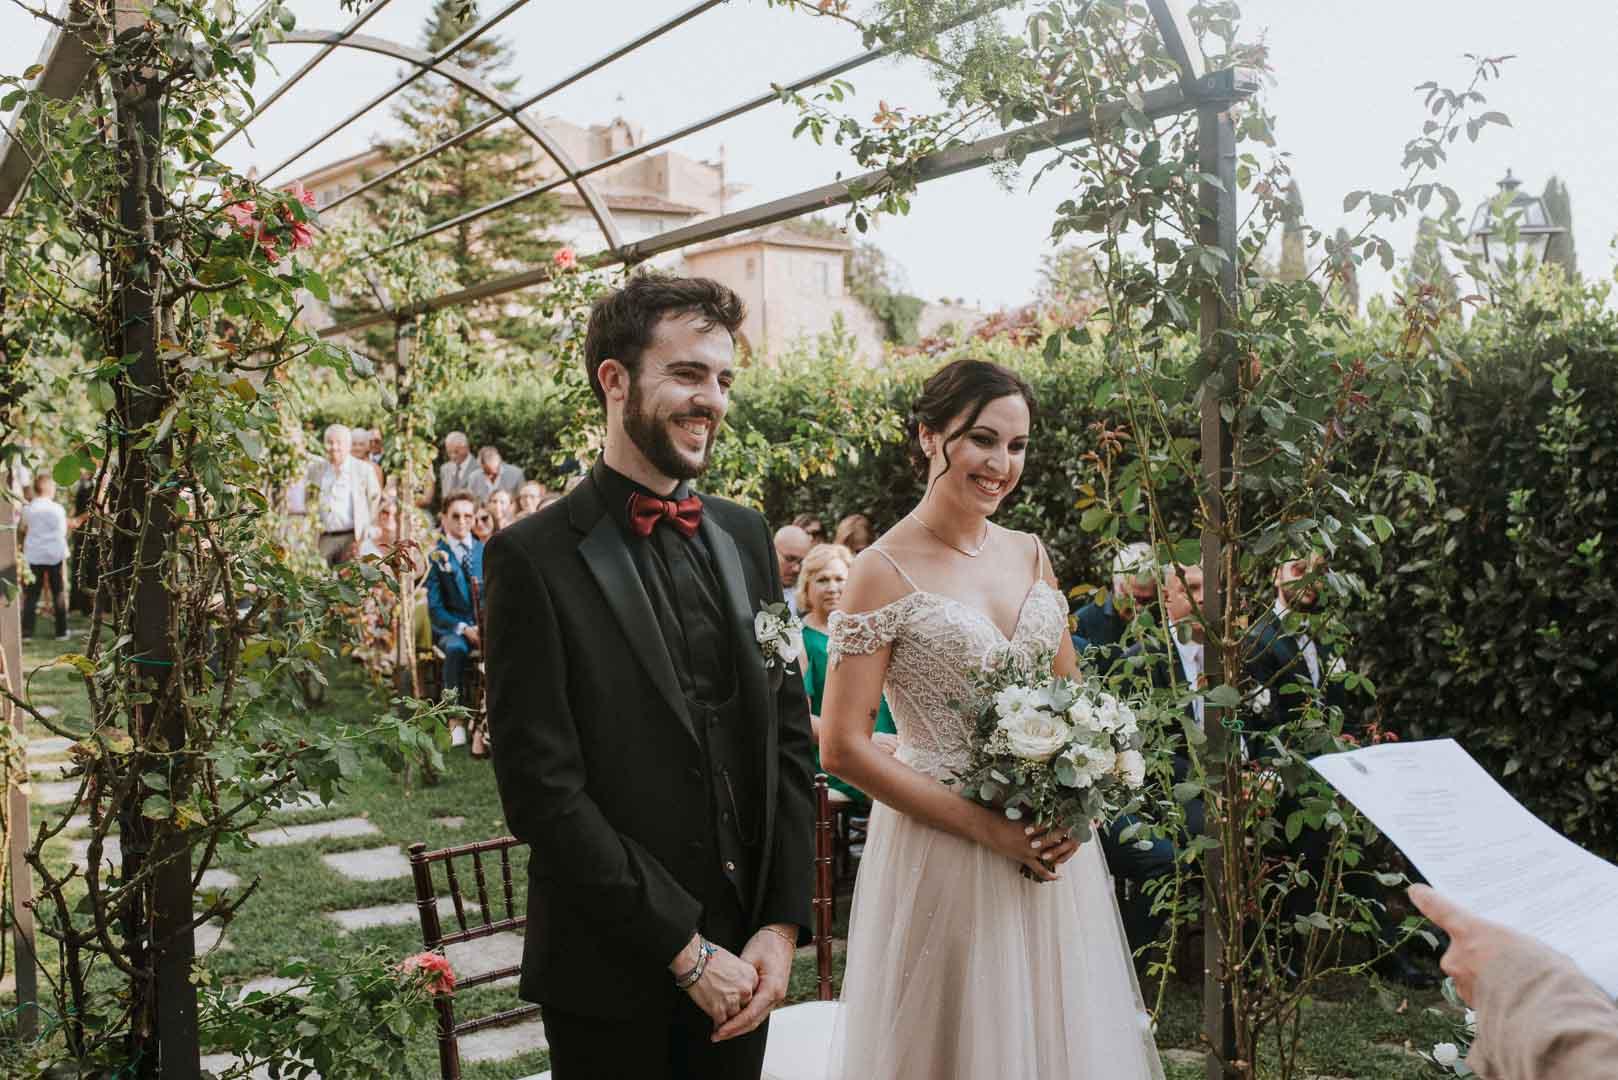 wedding-photographer-destination-fineart-bespoke-reportage-tuscany-villascorzi-vivianeizzo-spazio46-70